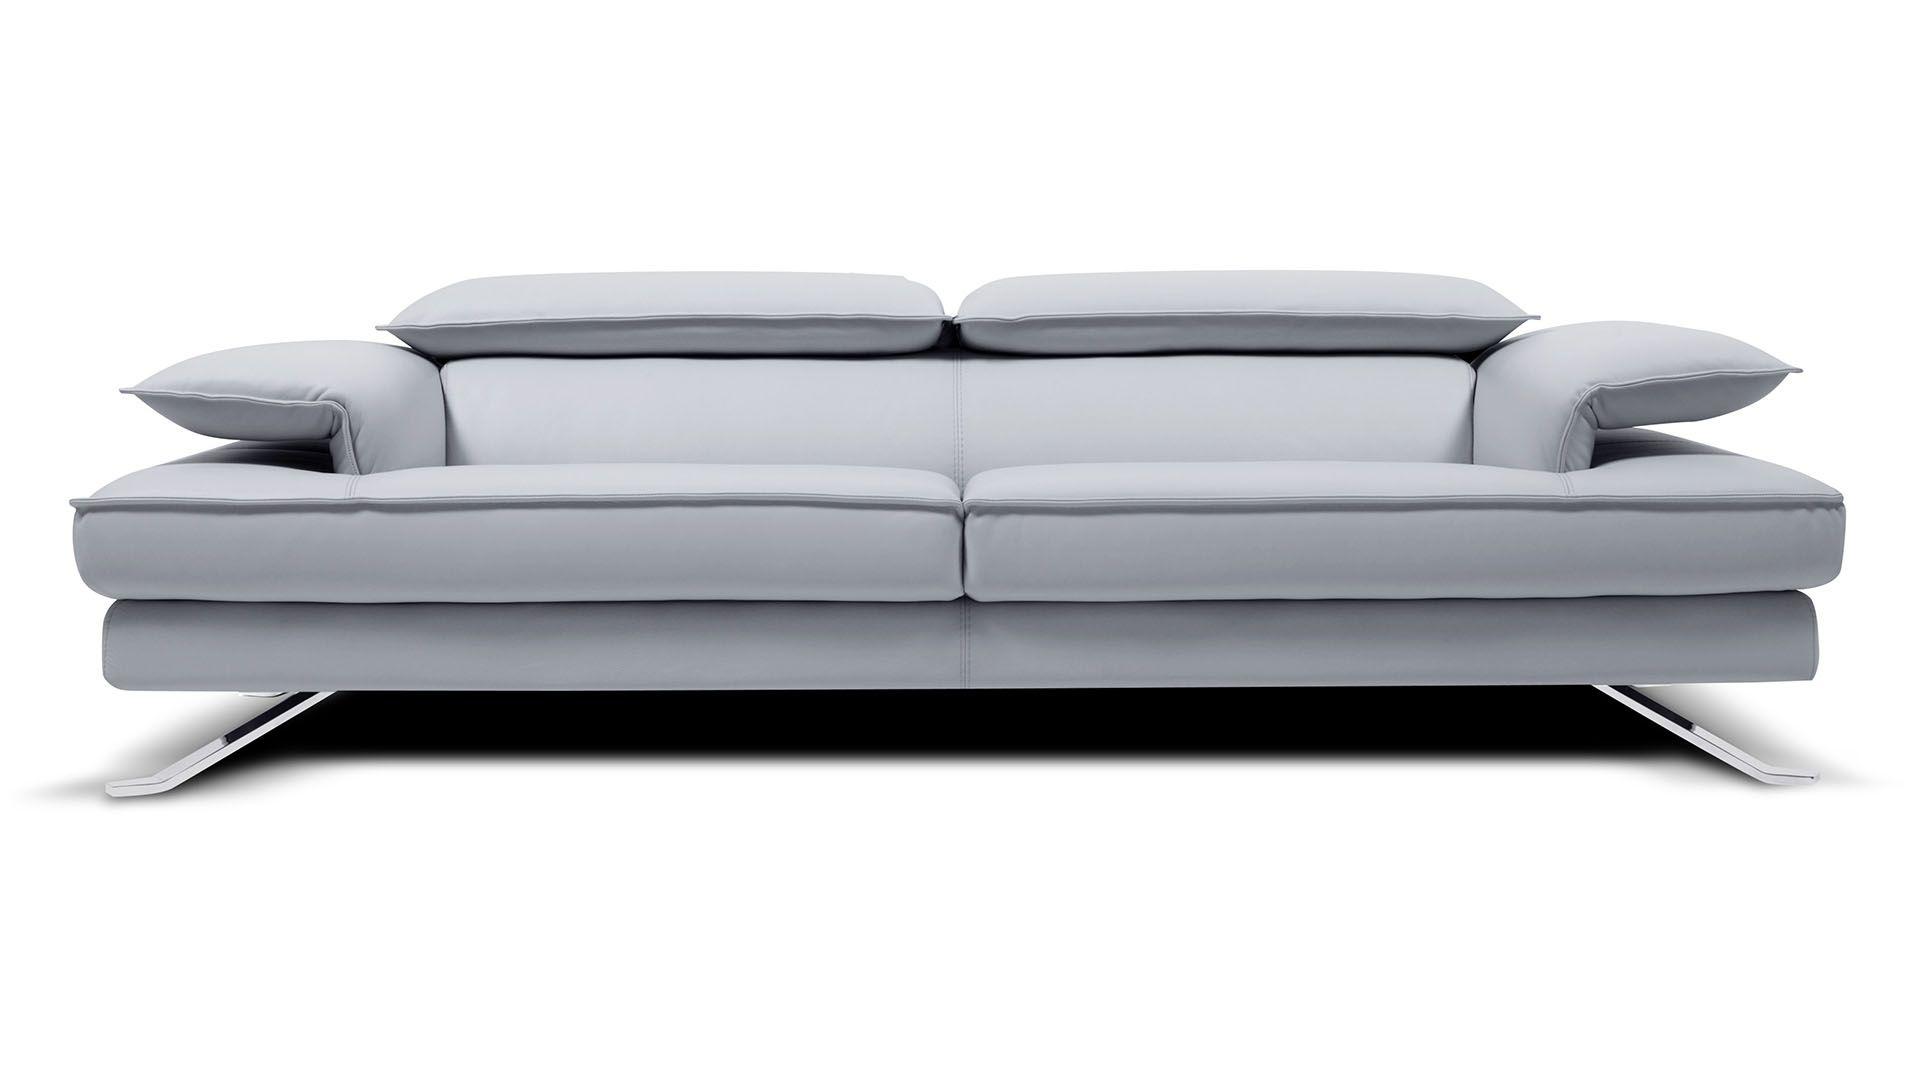 Soffio Kermes Salotti Furniture Pinterest